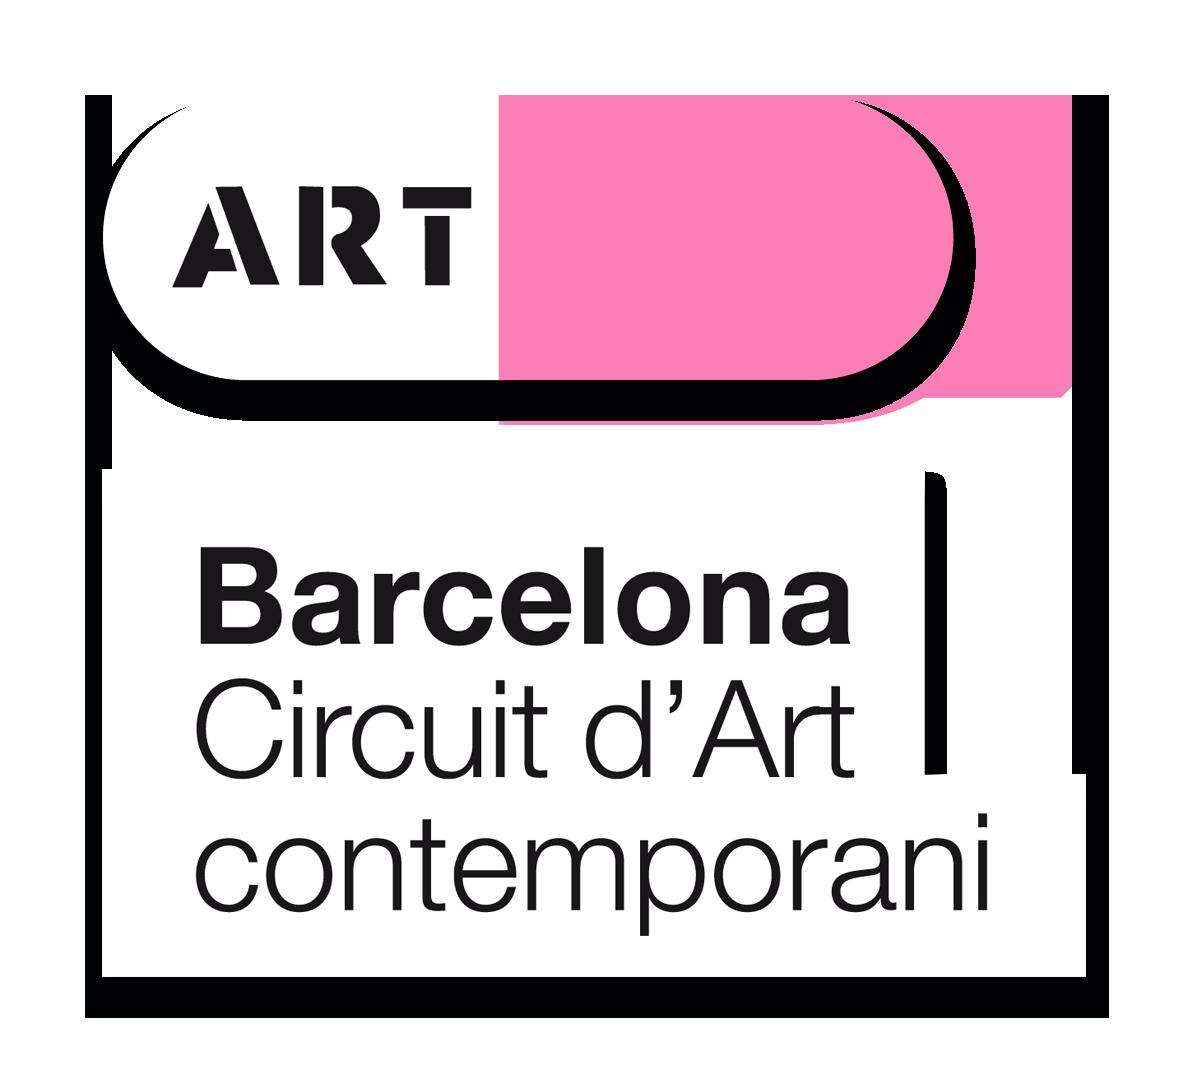 Barcelona Circuit d'Art contemporani